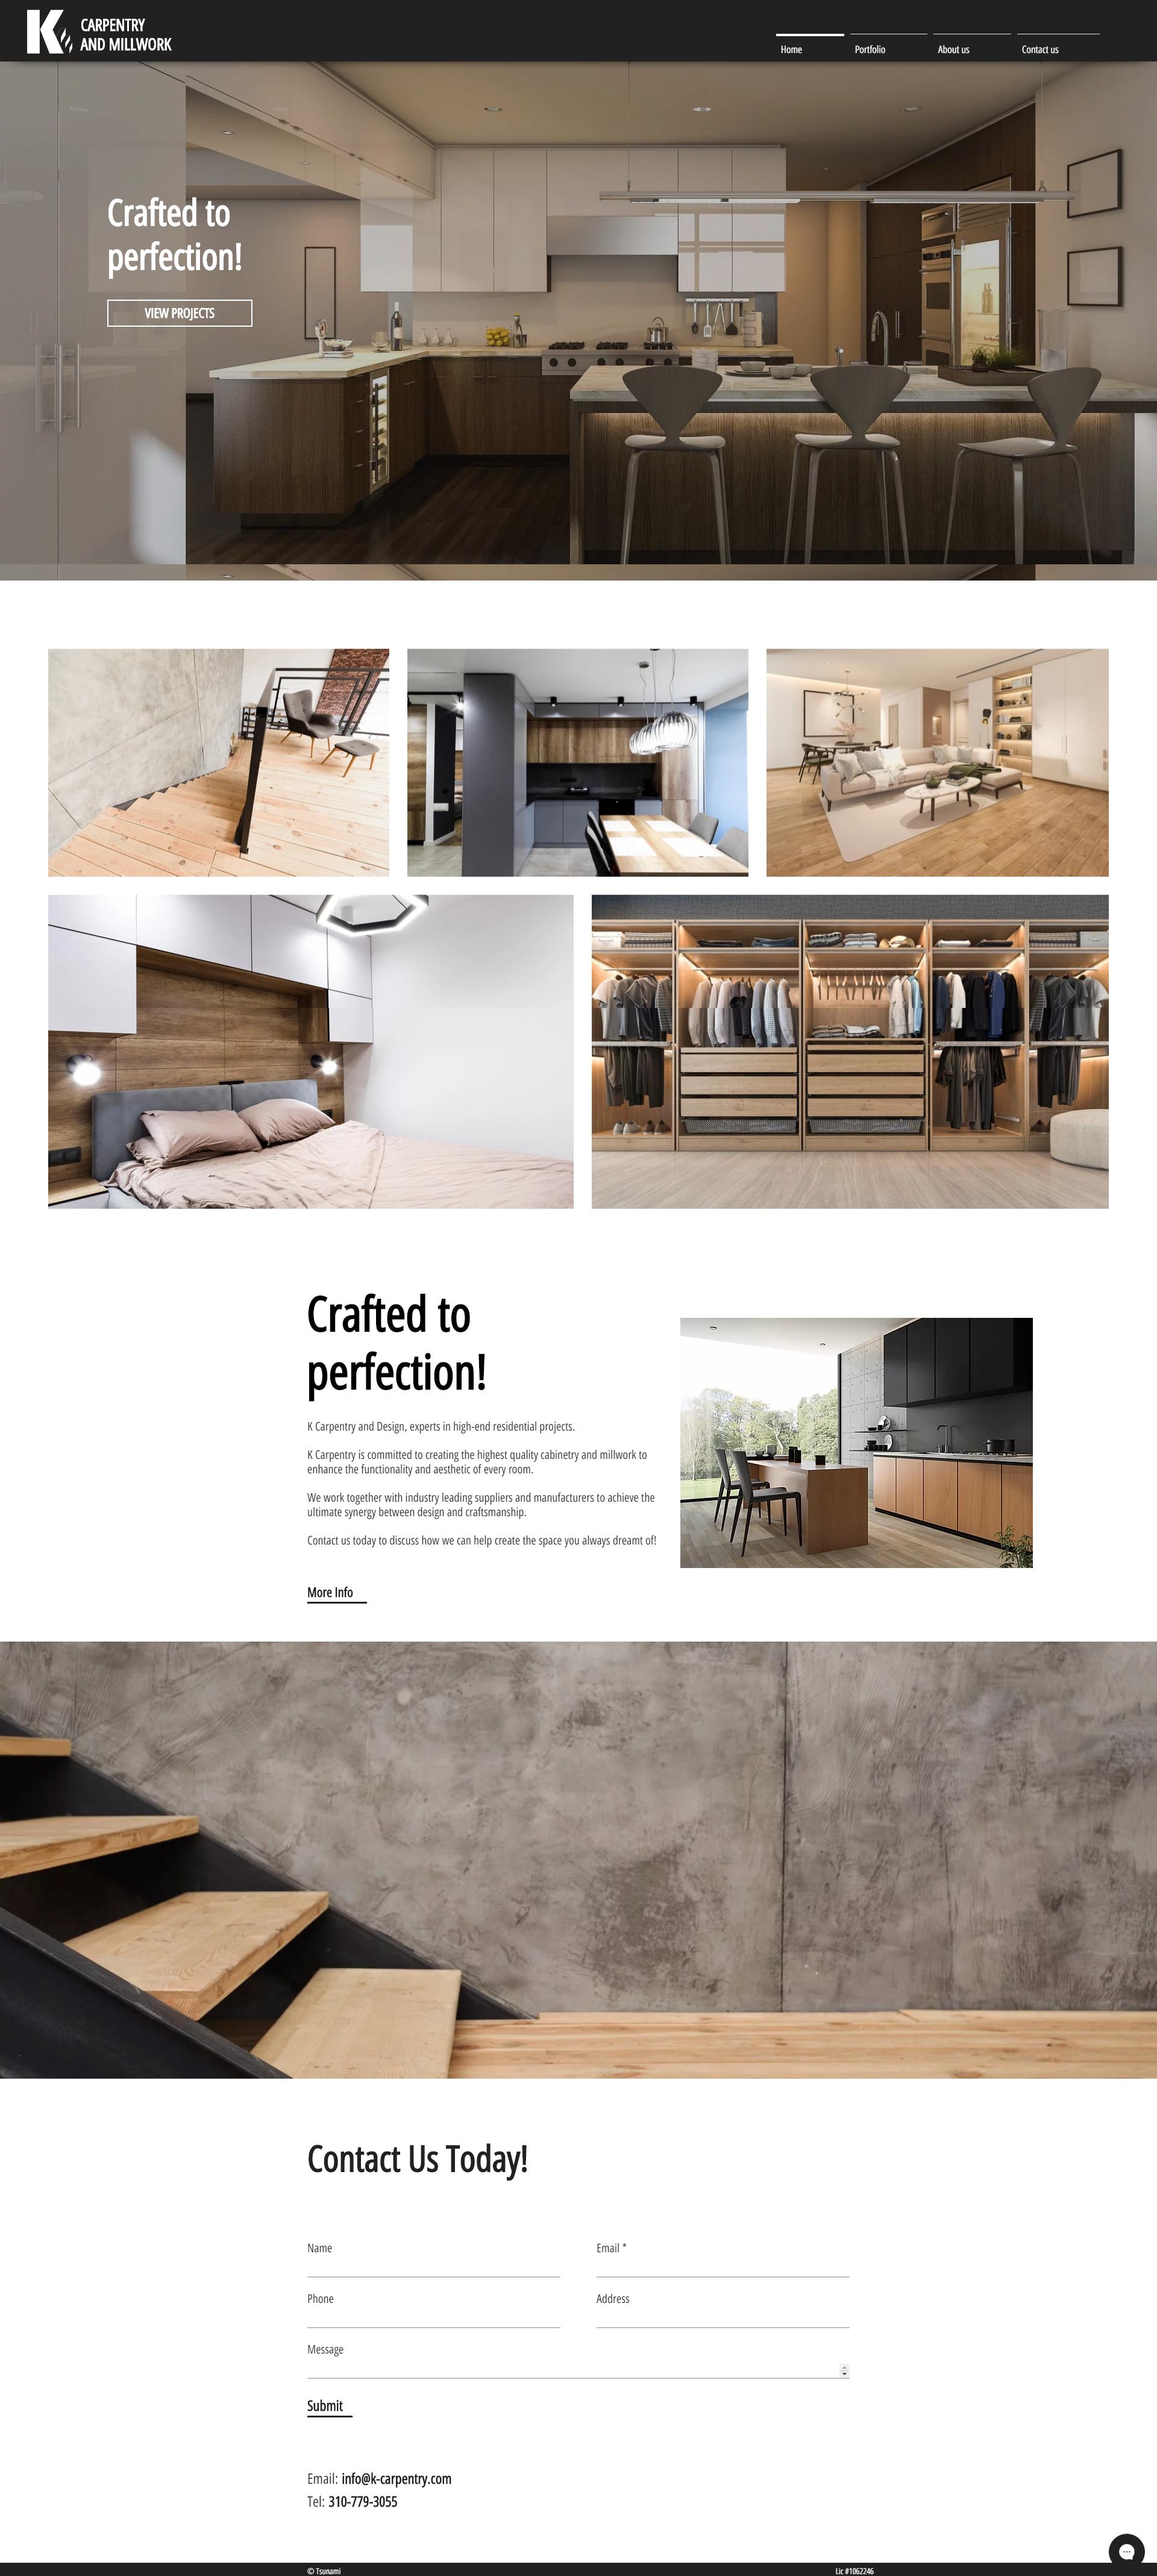 K-Carpentry & Millwork